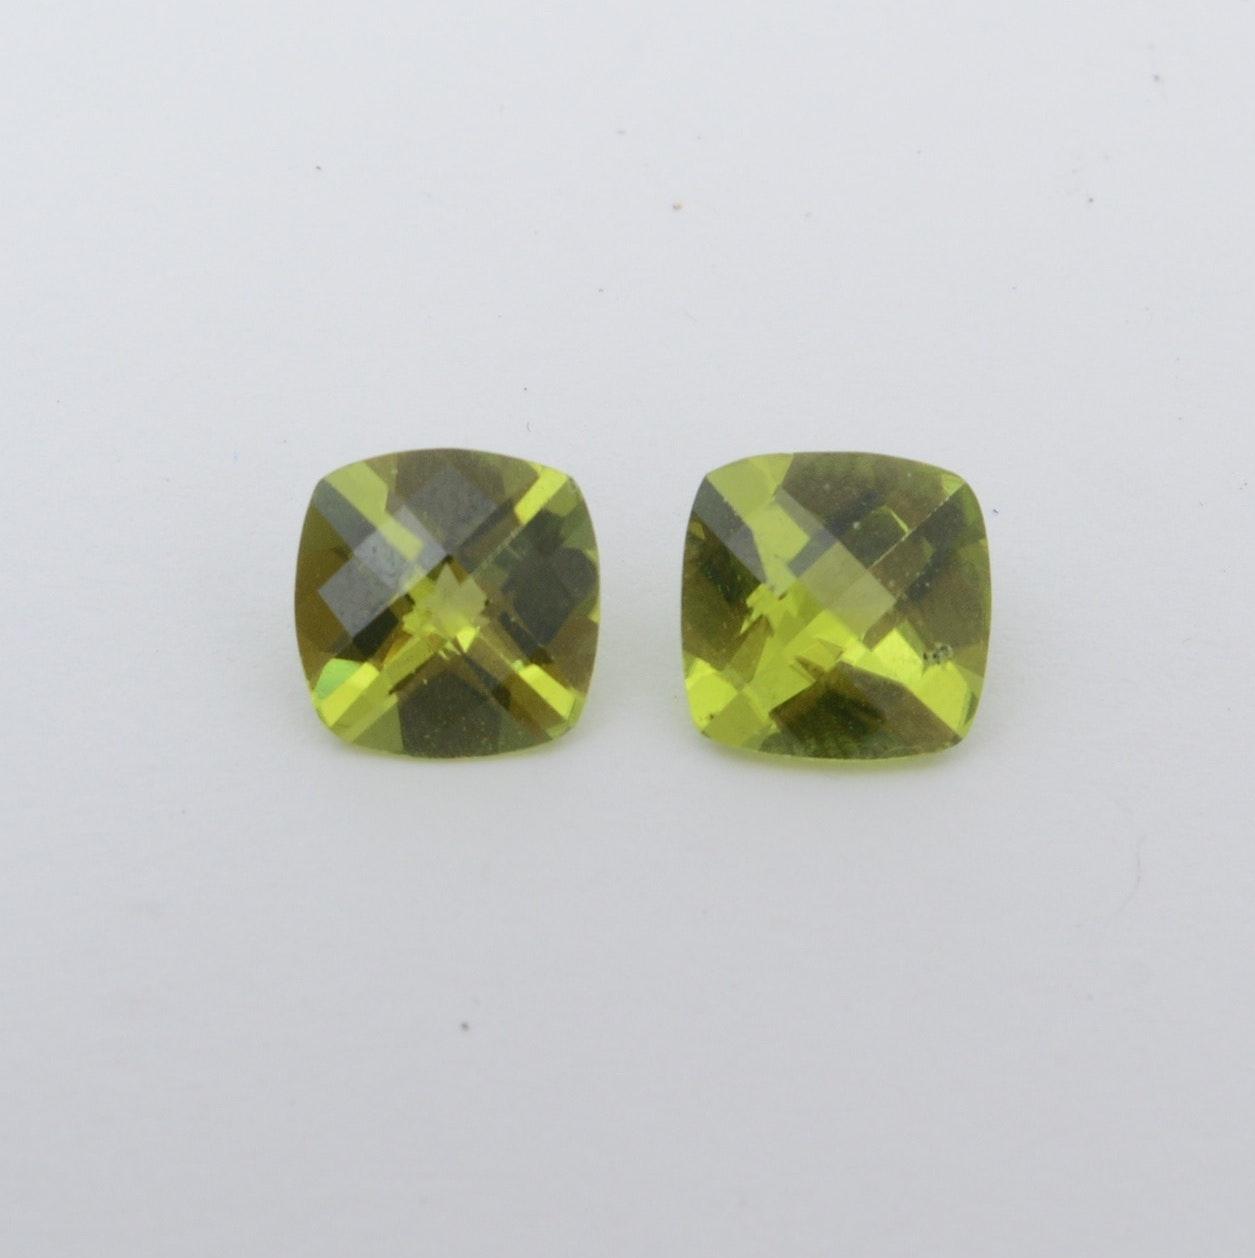 Pair of Peridot Loose Gemstones